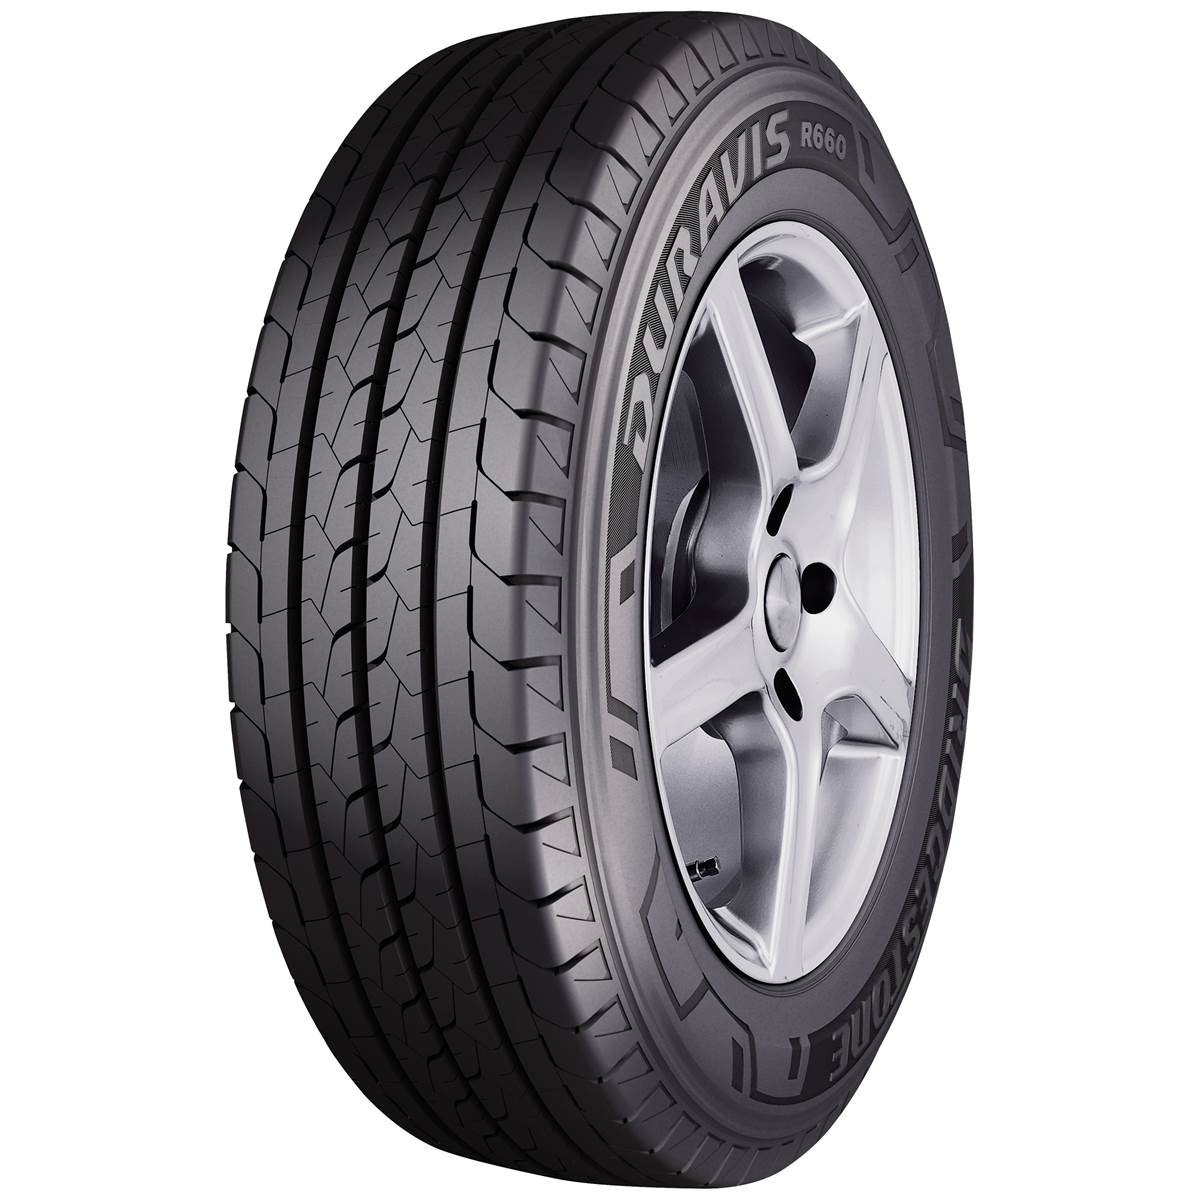 Pneu Camionnette Bridgestone 165/70R14 89R Duravis R660